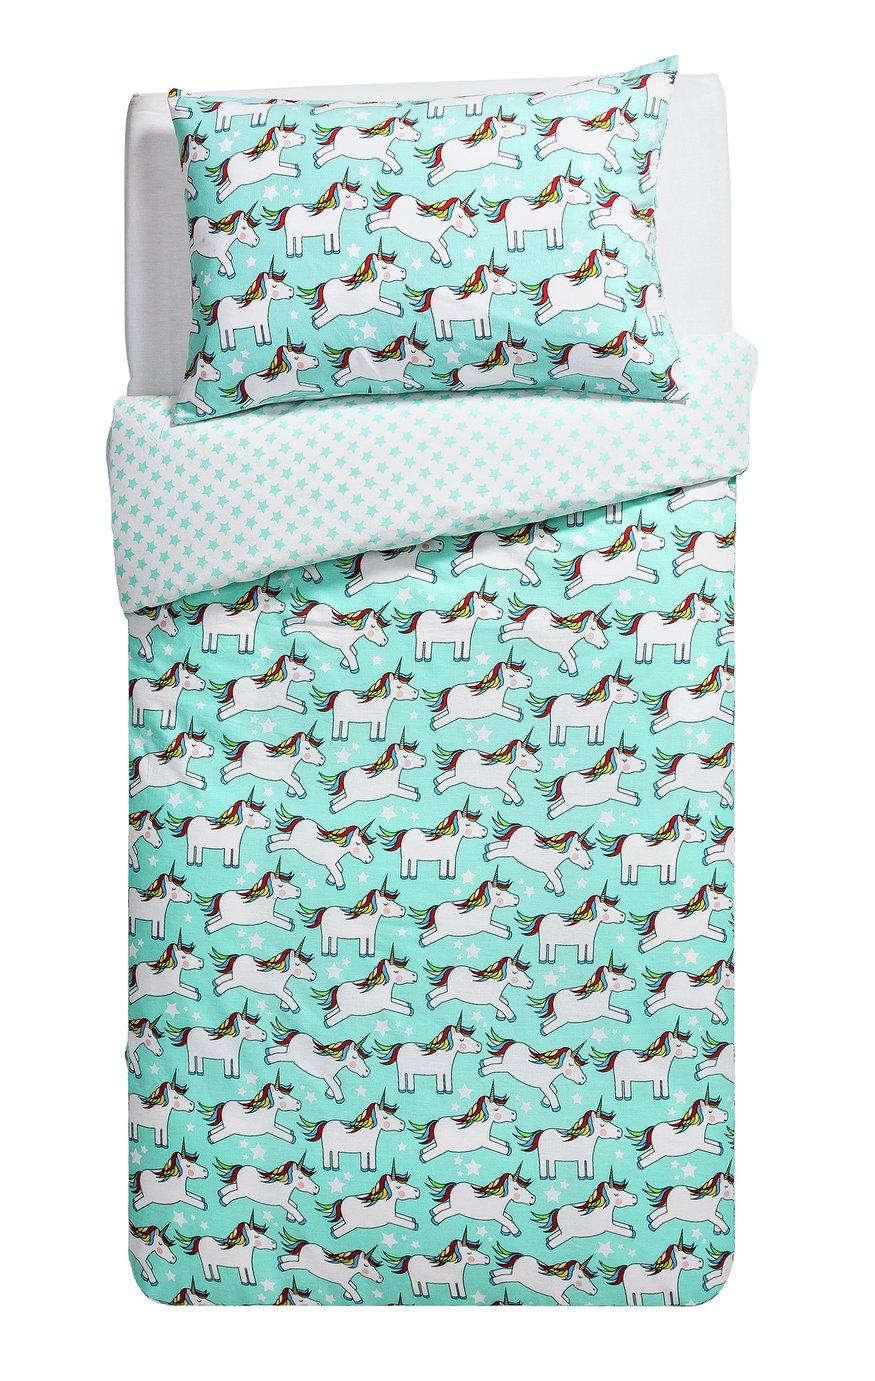 buy home unicorn bedding set - single at argos.co.uk - your online